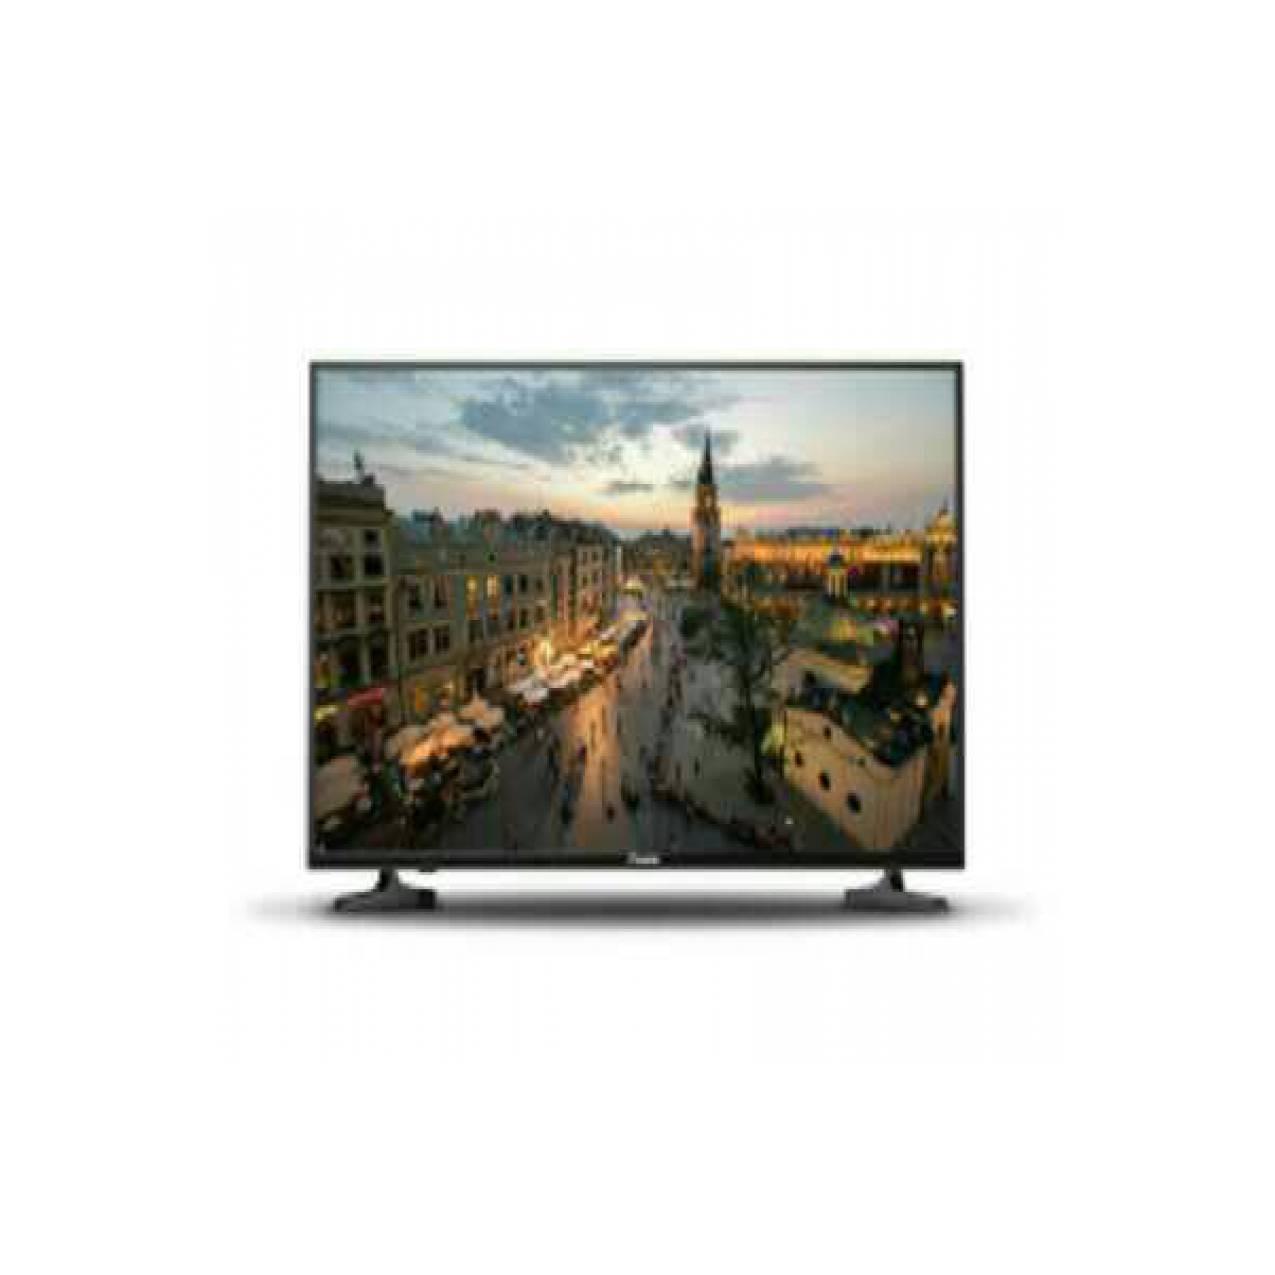 Panasonic Th 43e305 Tv Led Hitam 43 Inch 1080p Ips Daftar Lihat Akari Le 55d88sb Uhd